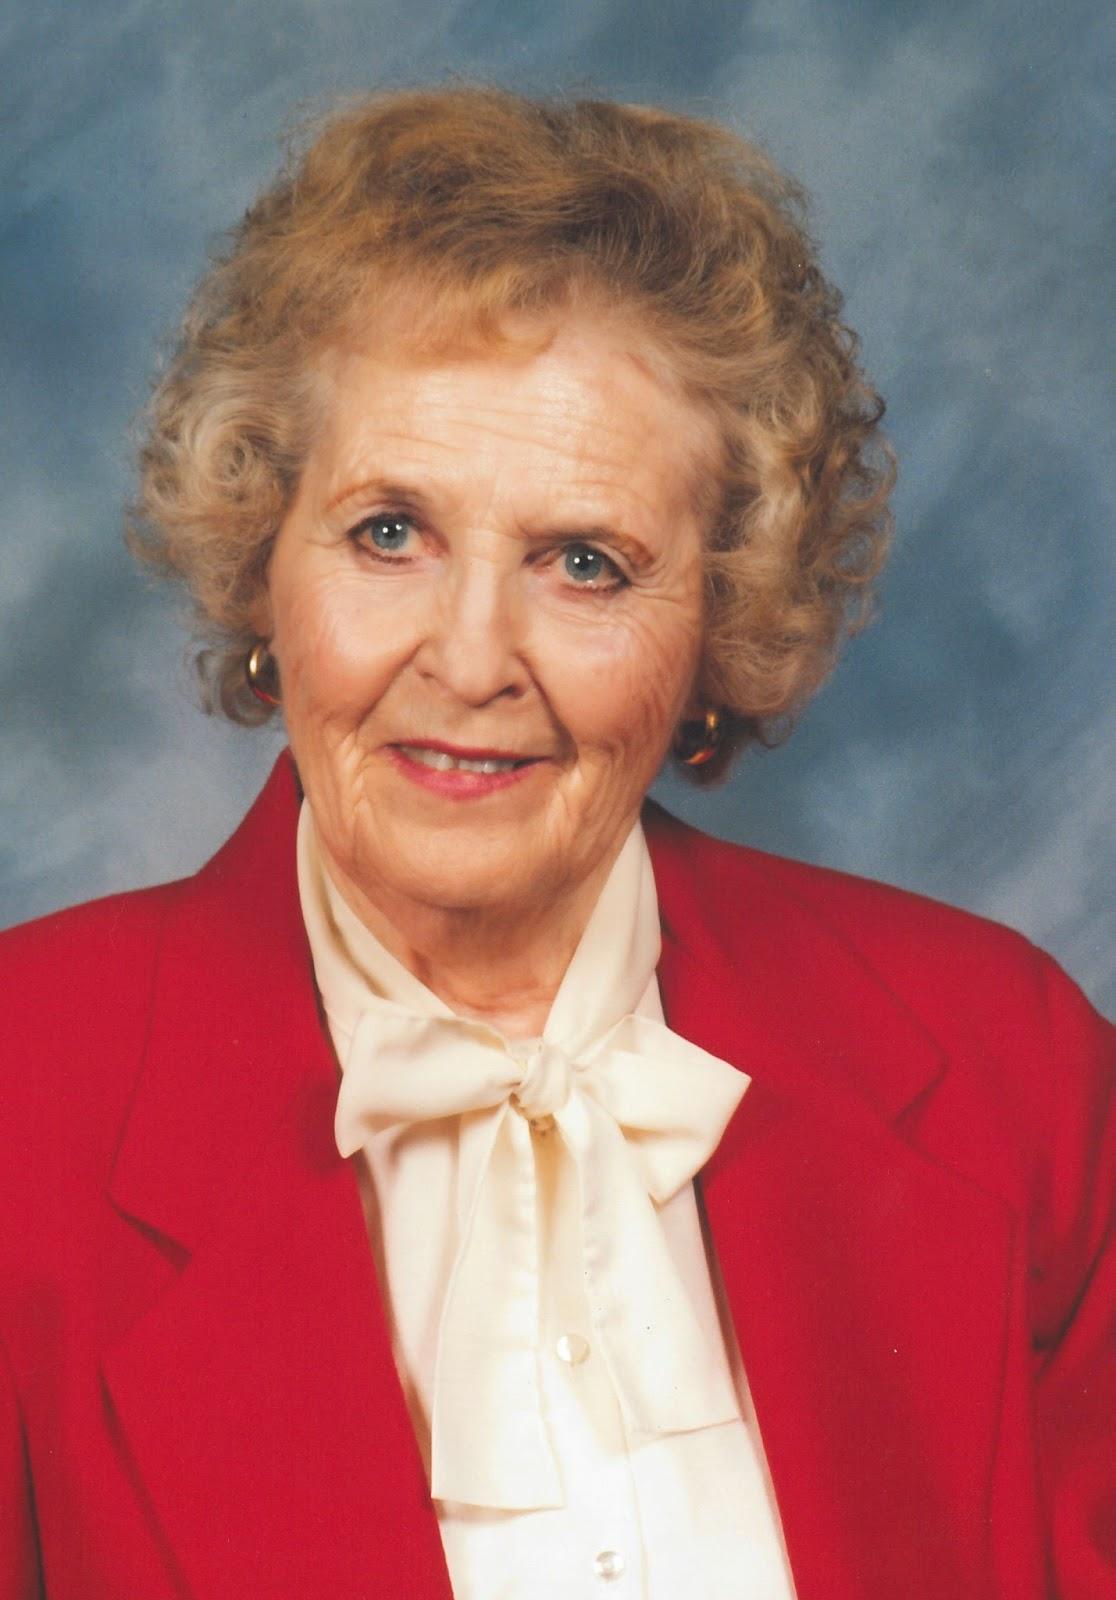 Forum on this topic: Renuka Menon, tessa-wyatt-born-1948/